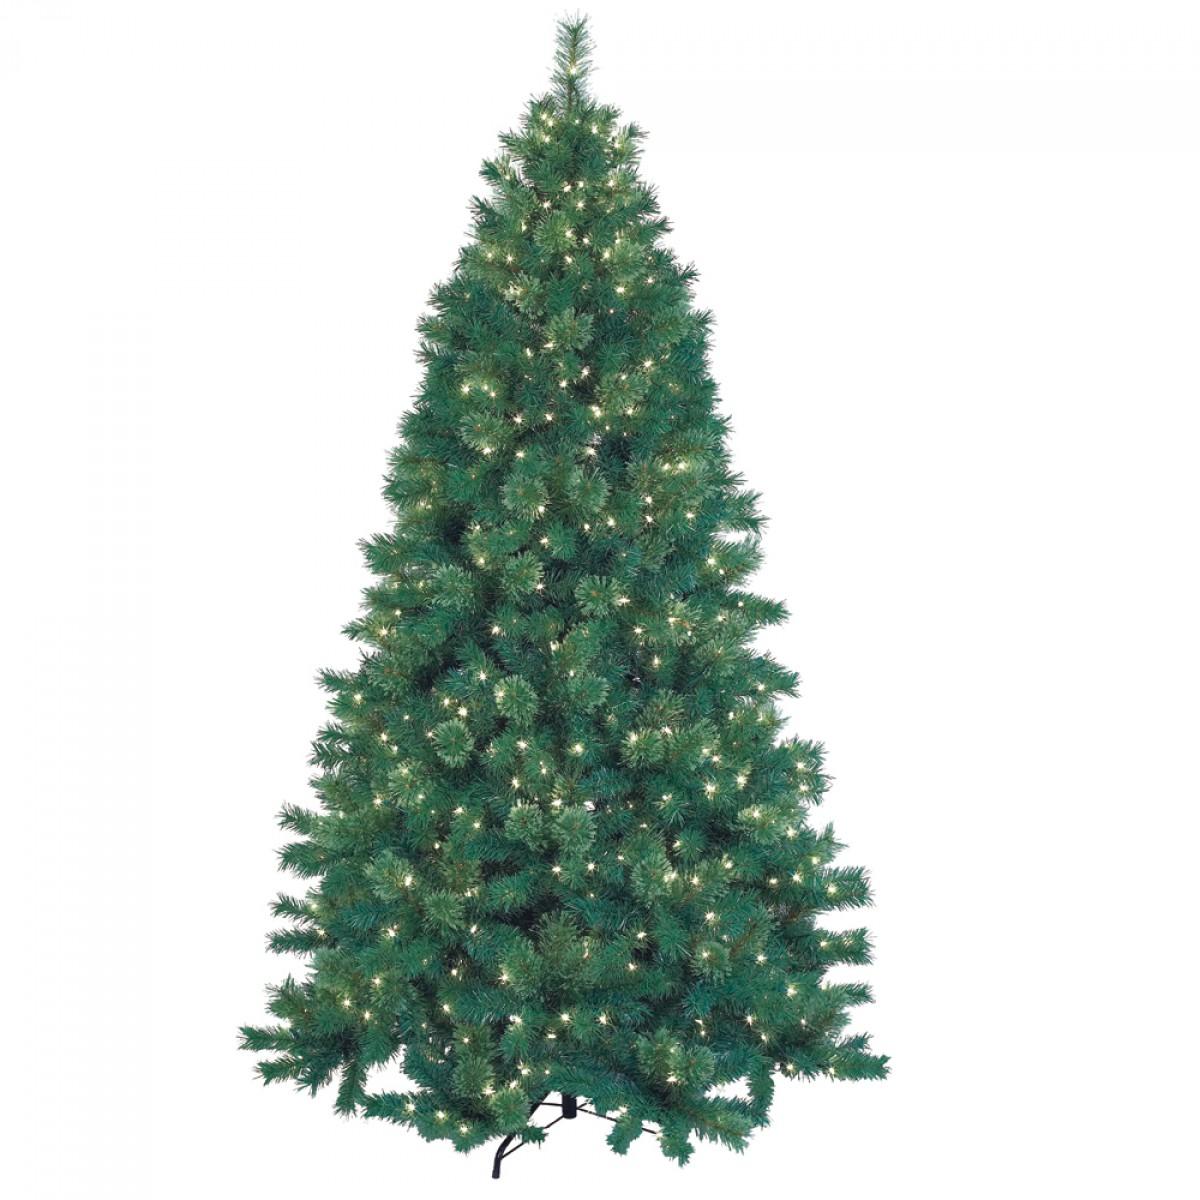 Artificial Christmas Trees 9 Feet